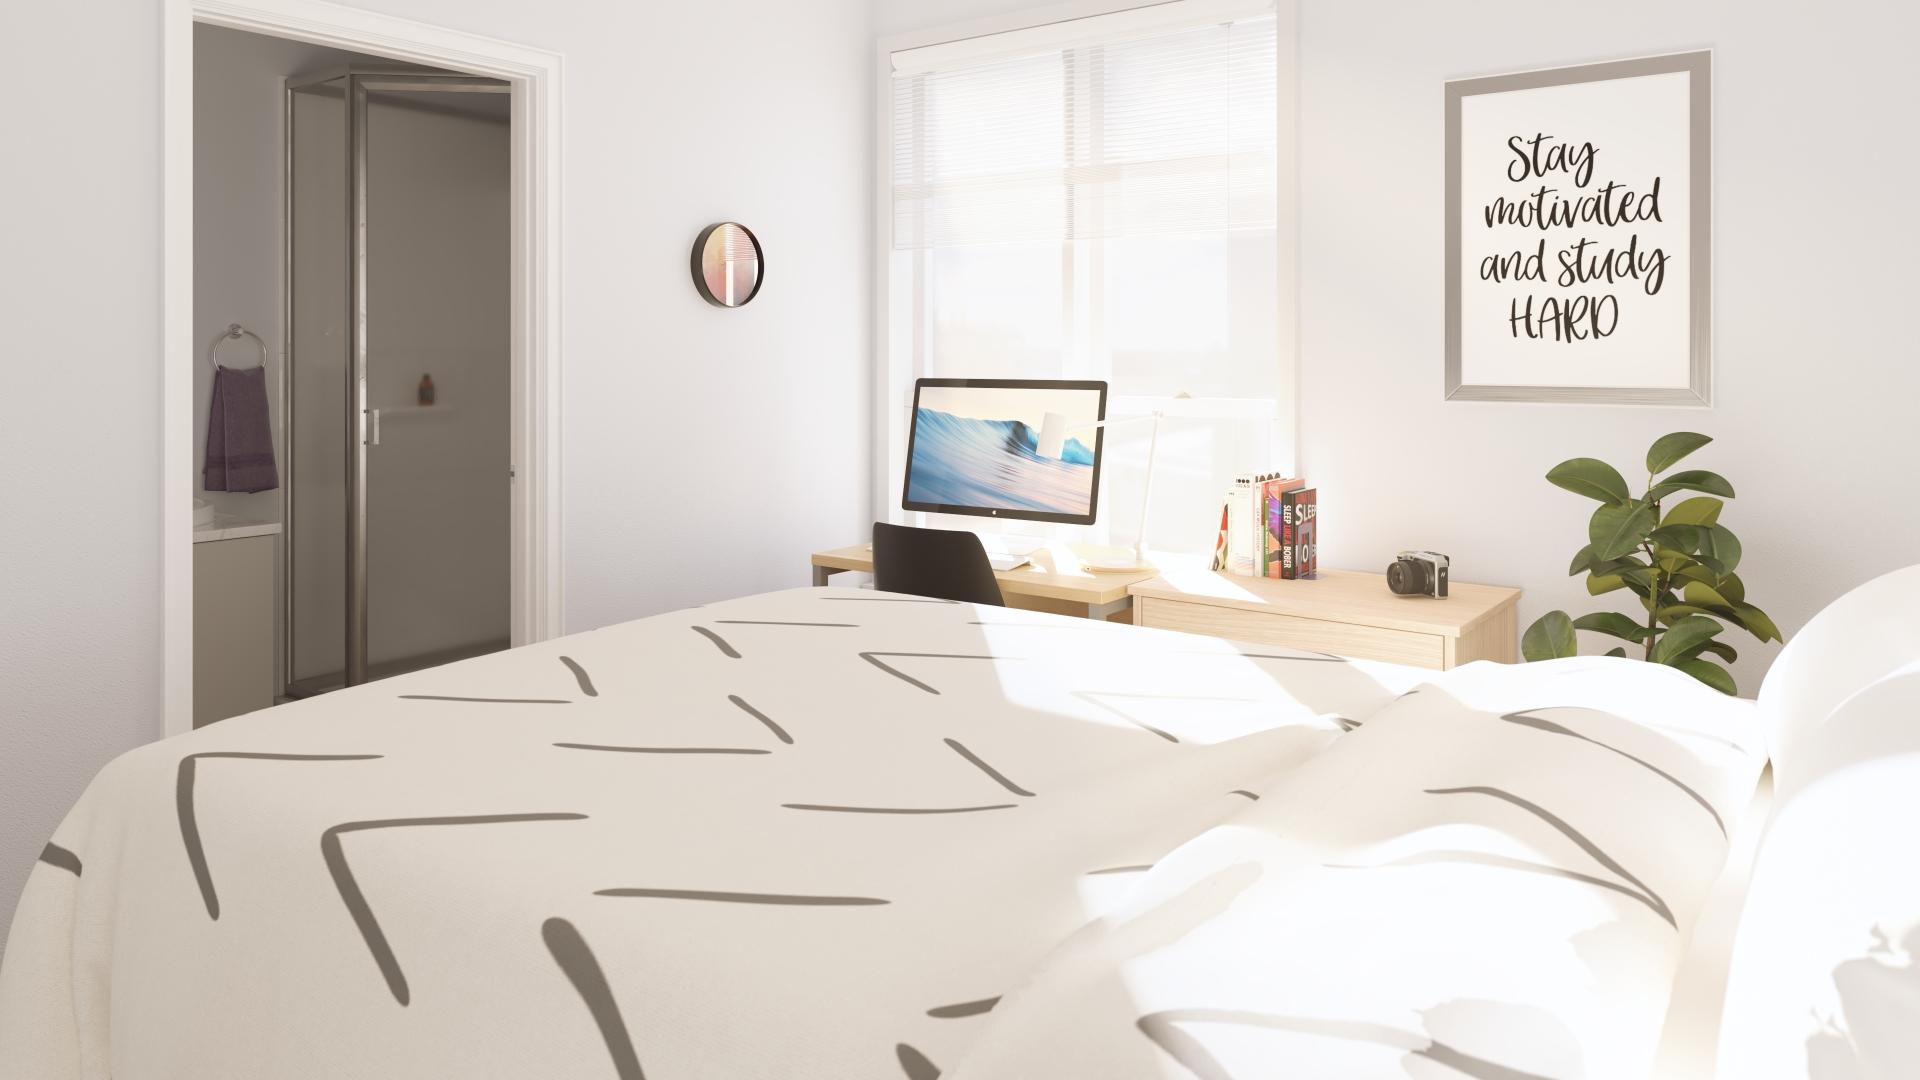 Domus Student Housing, The W London